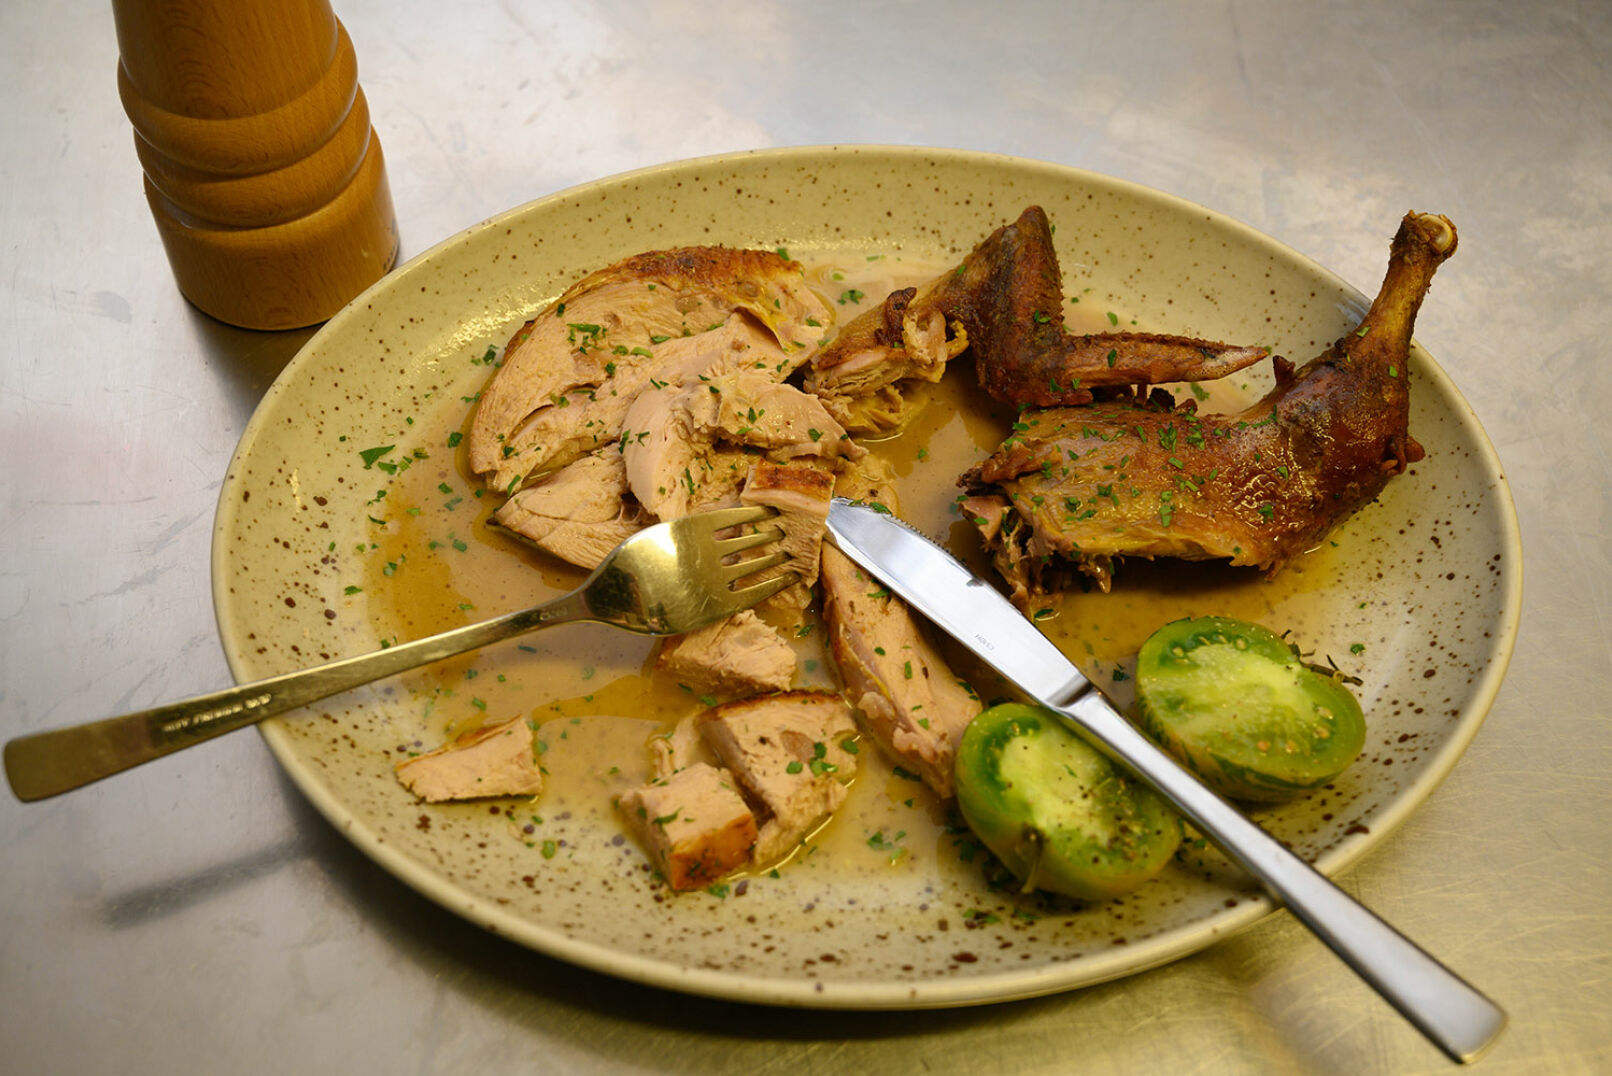 Passende Beilagen sind etwa Gemüse, süßes Kraut oder Maronenpüree. – Guten Appetit! - © Barbara Marko